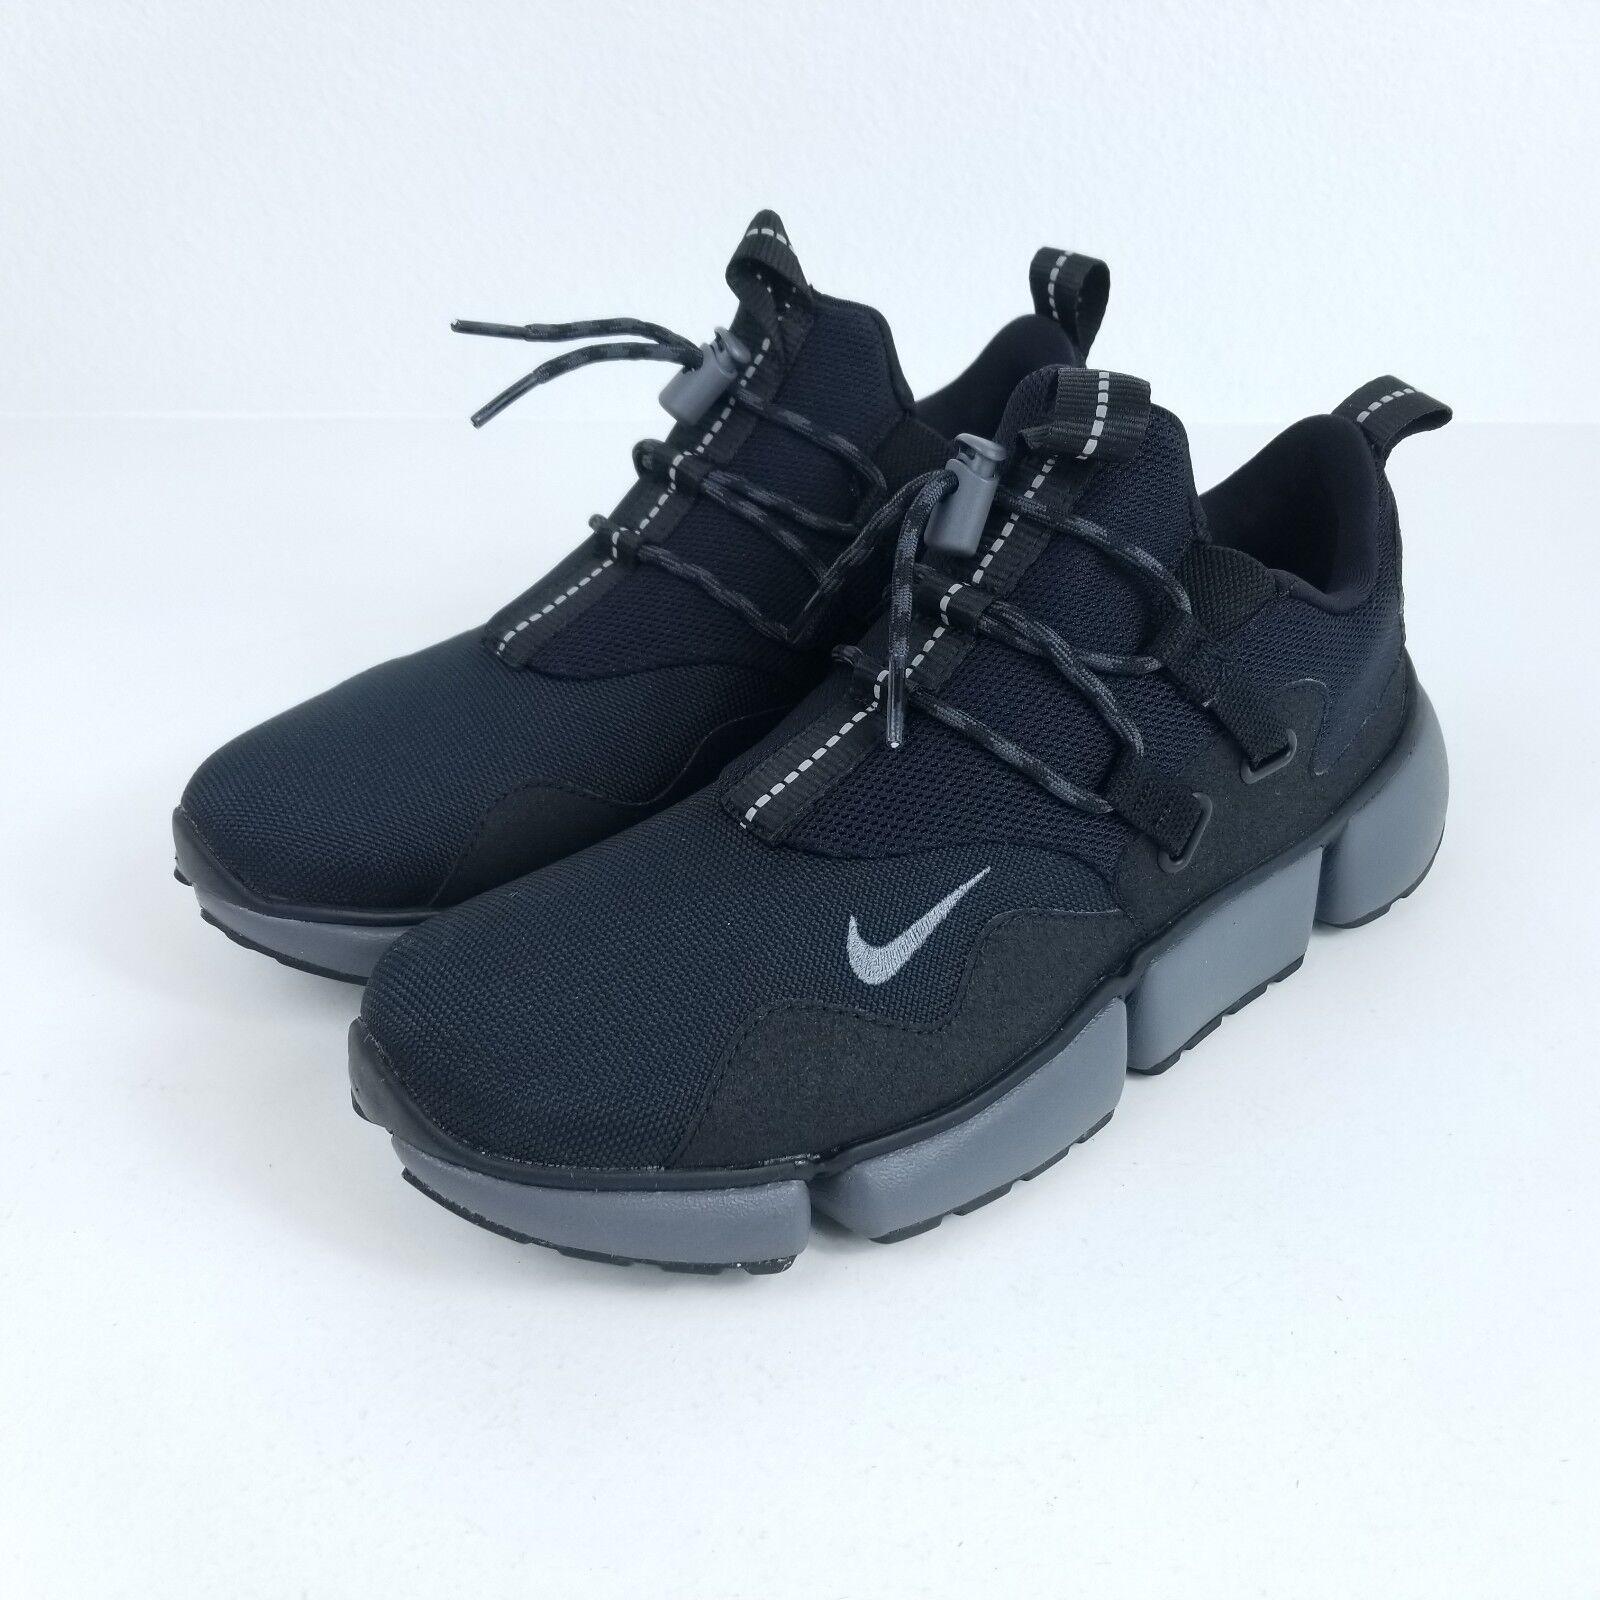 NIKE Pocket Knife DM Mens Sz 9.5 Shoes Black Gray 898033 003